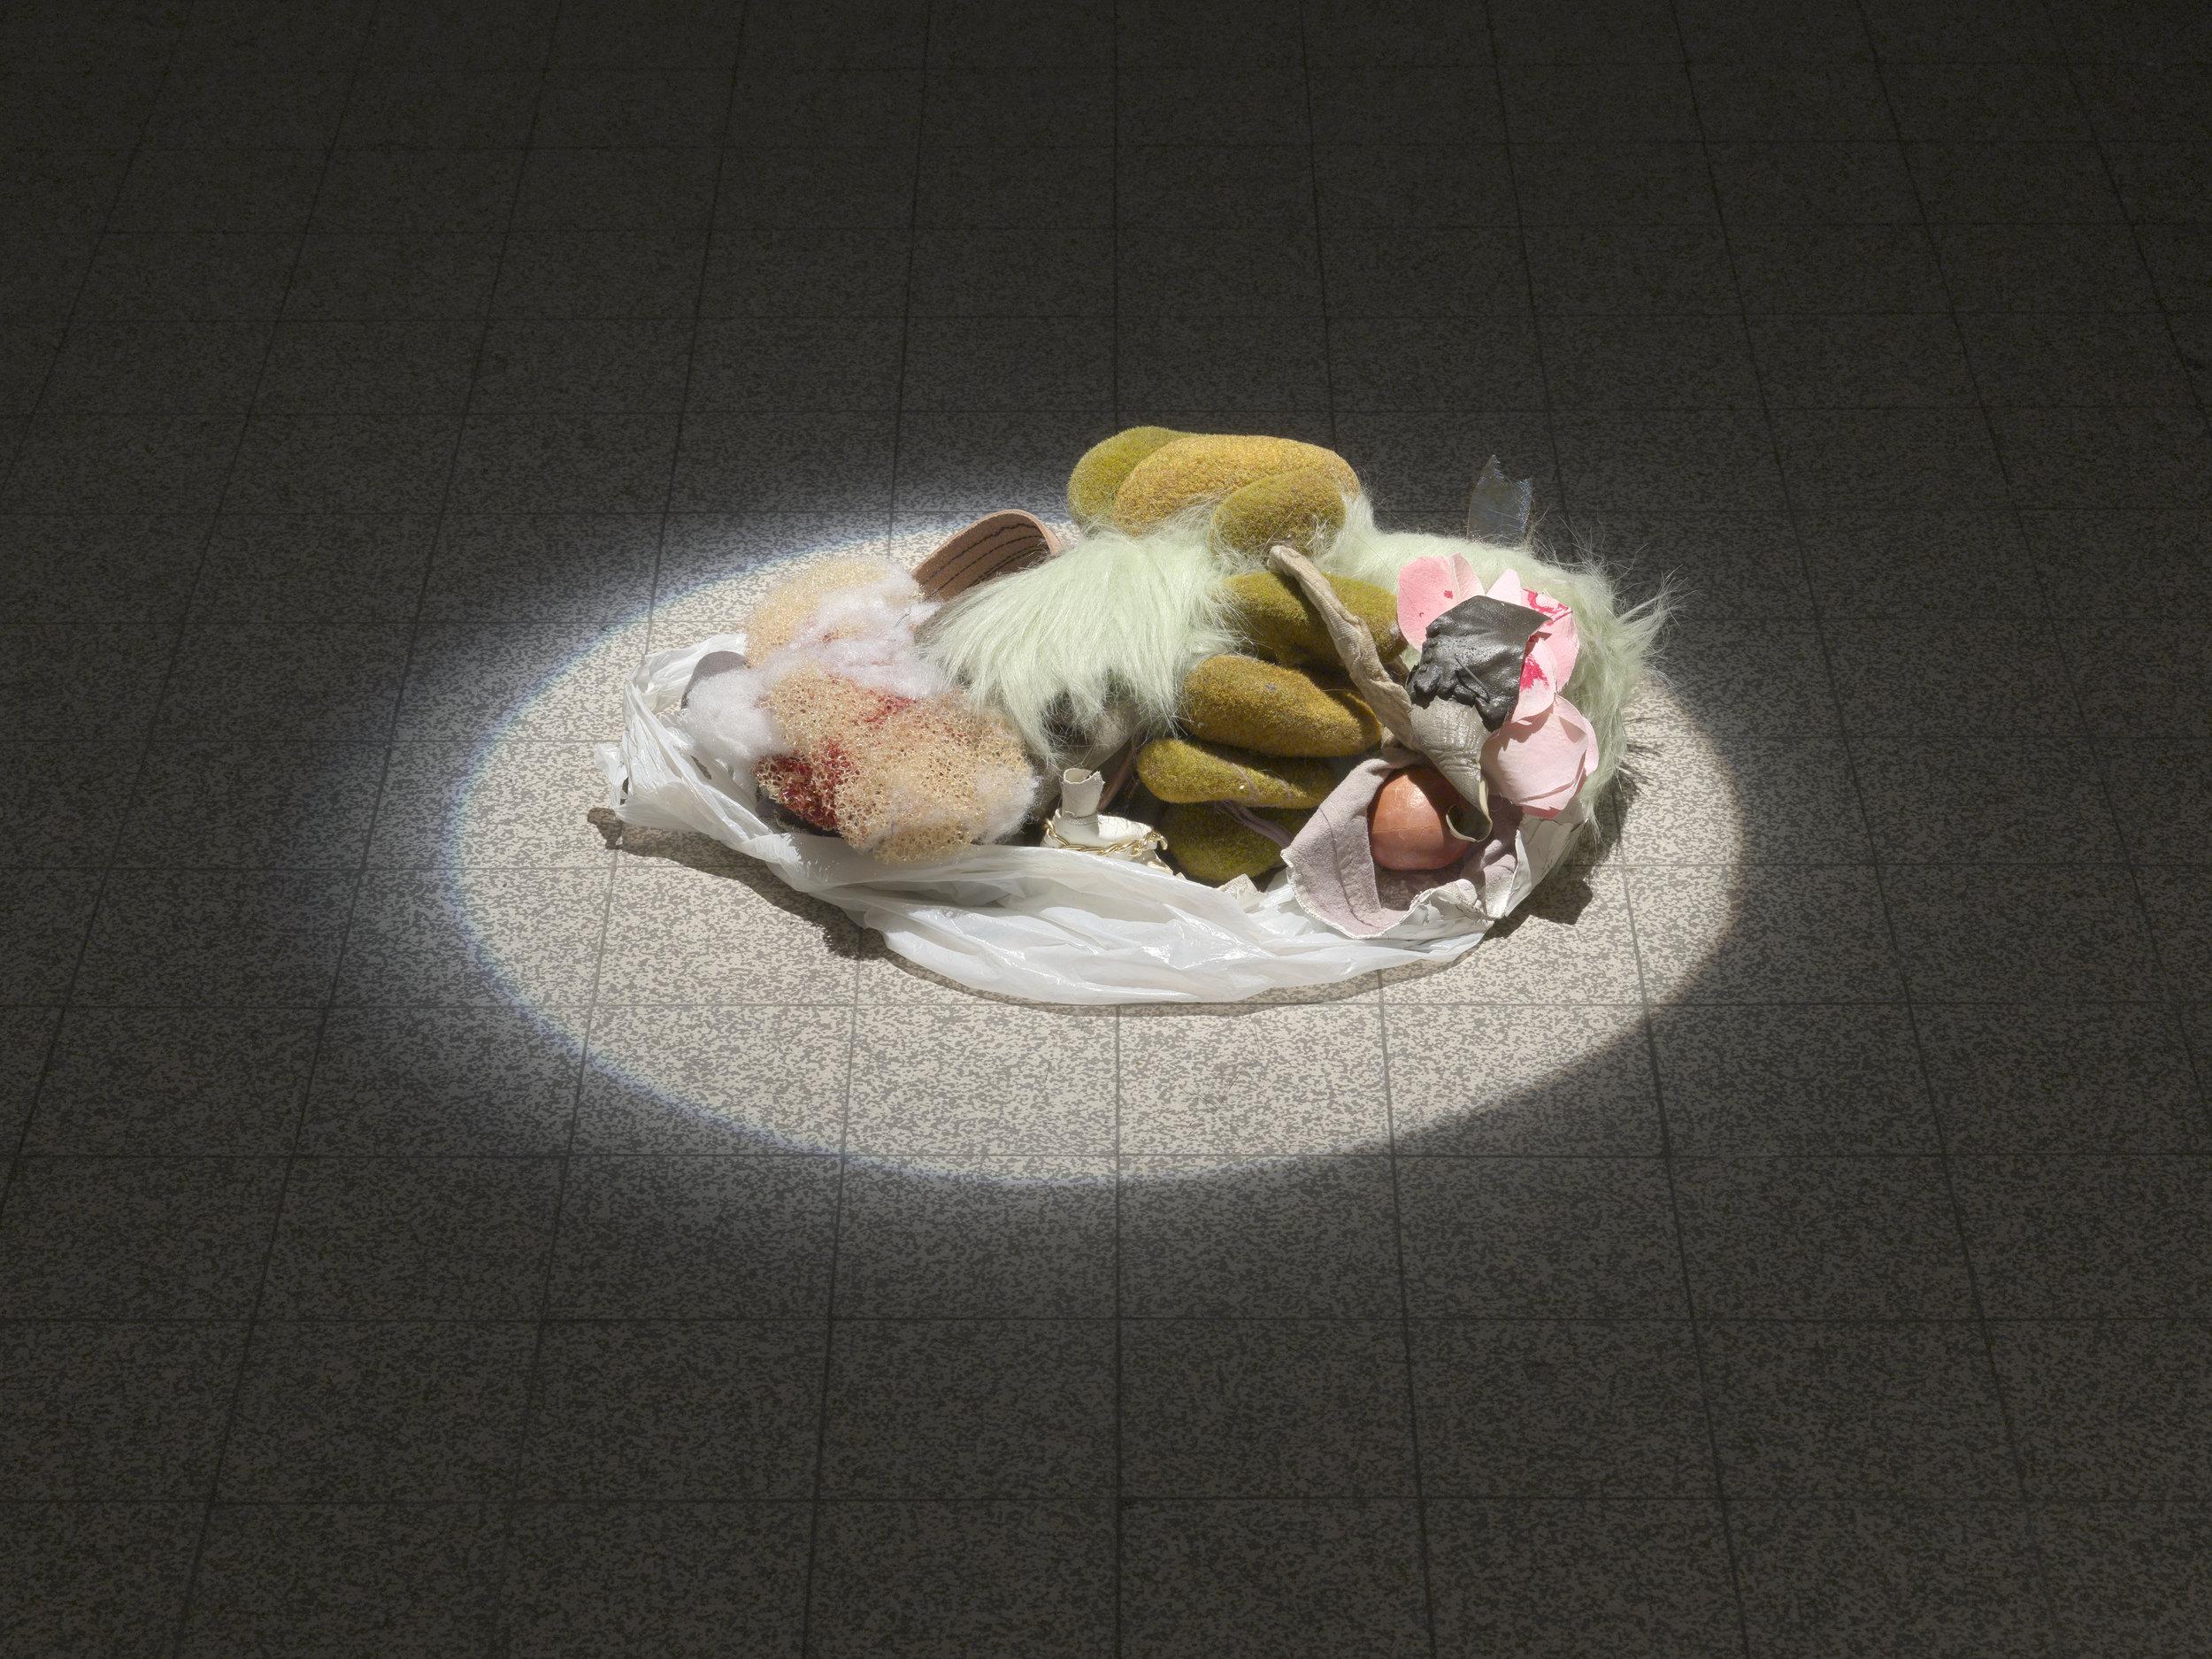 3 - Galerie Croy Nielsencurated byAnna Gritz